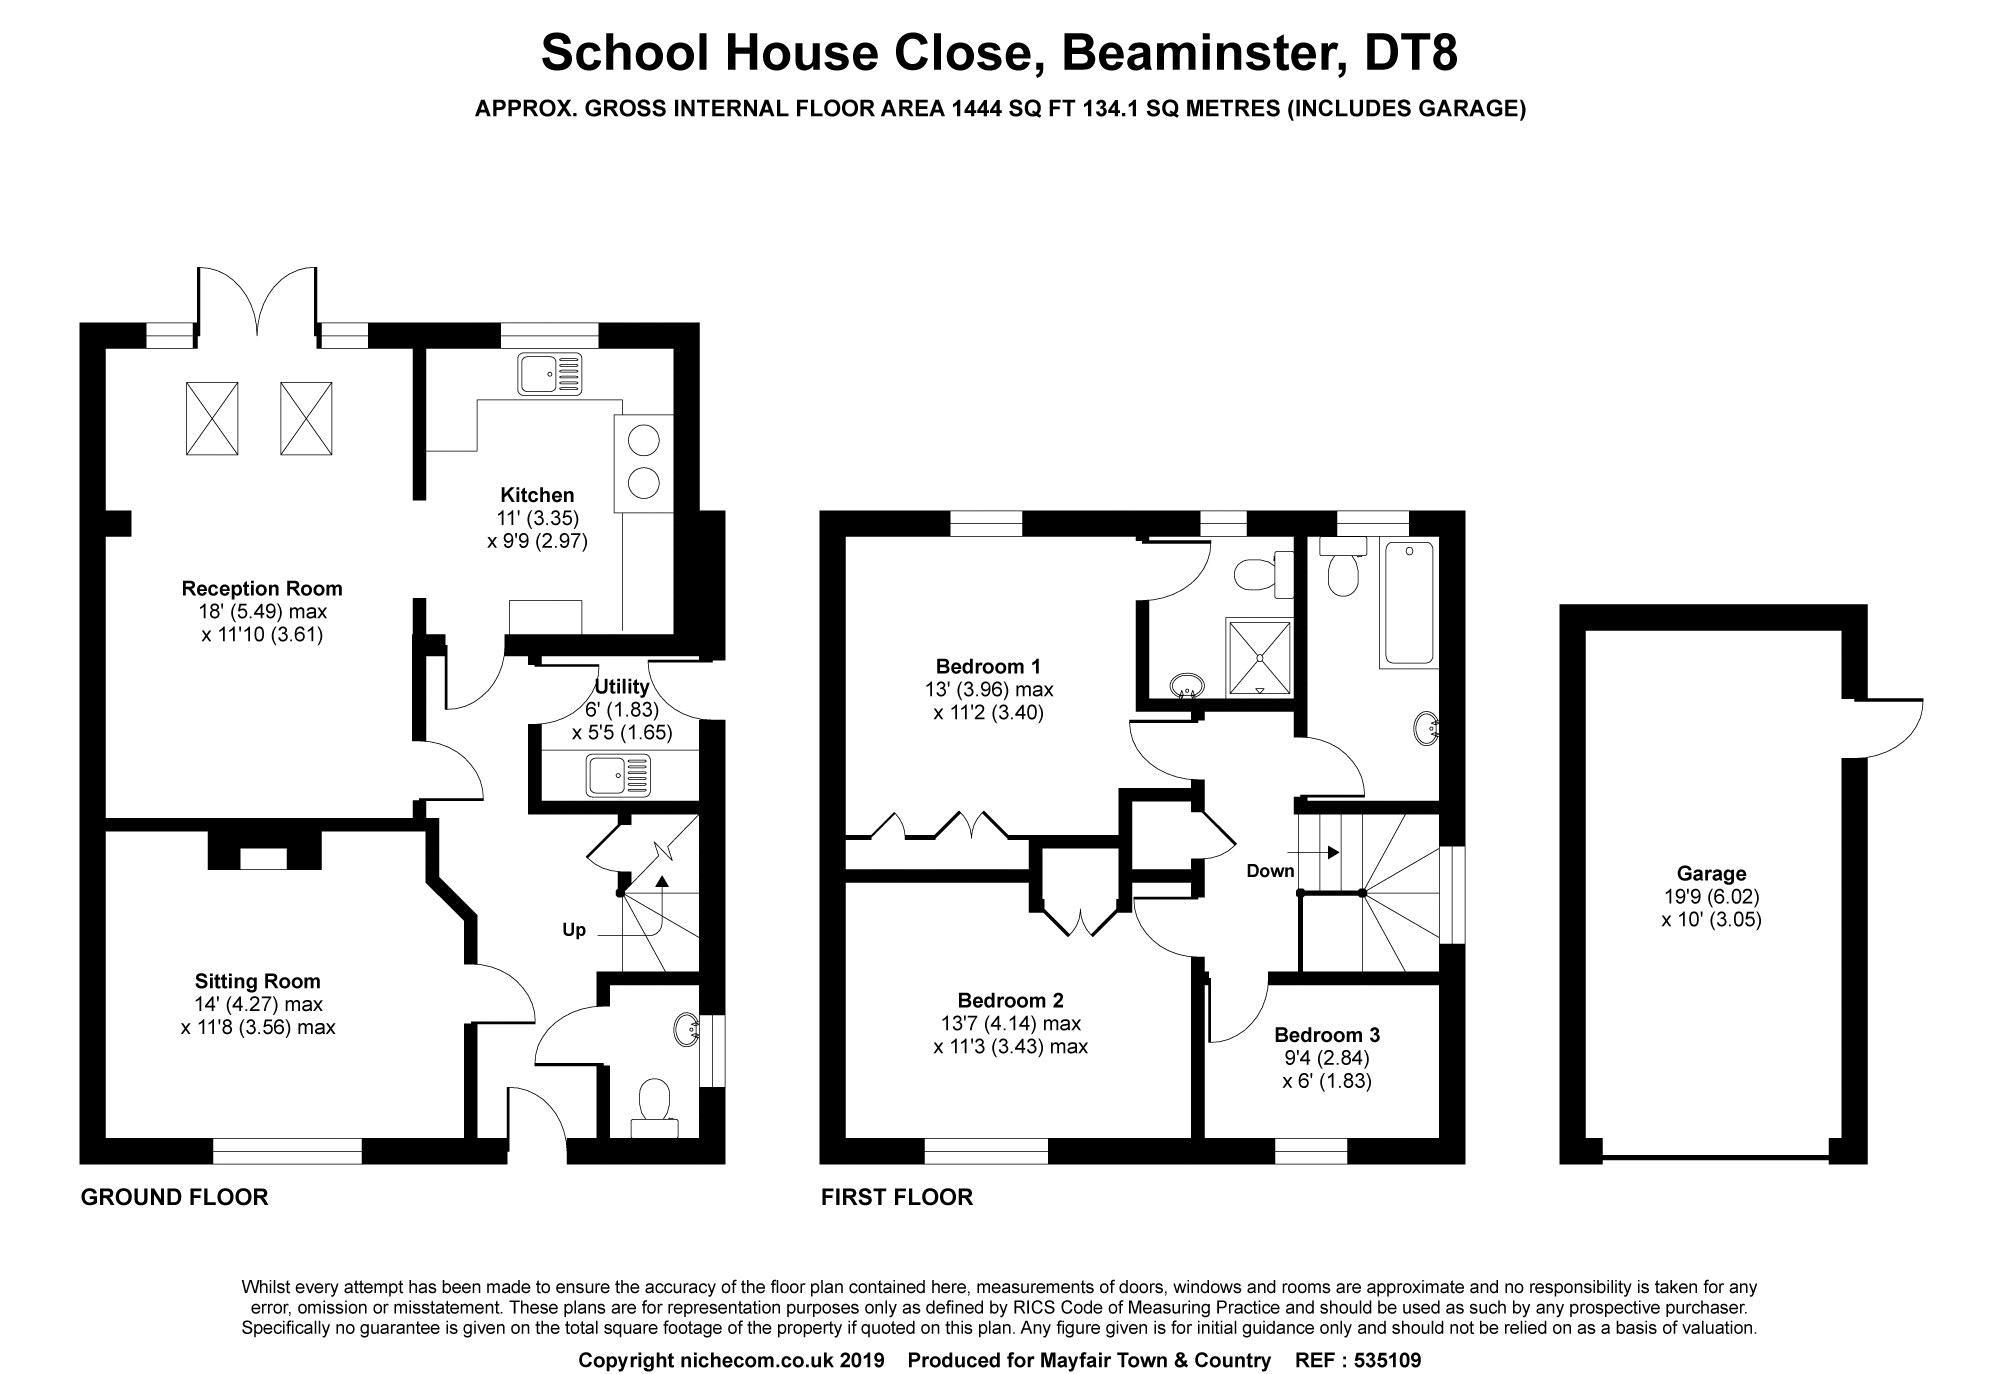 School House Close